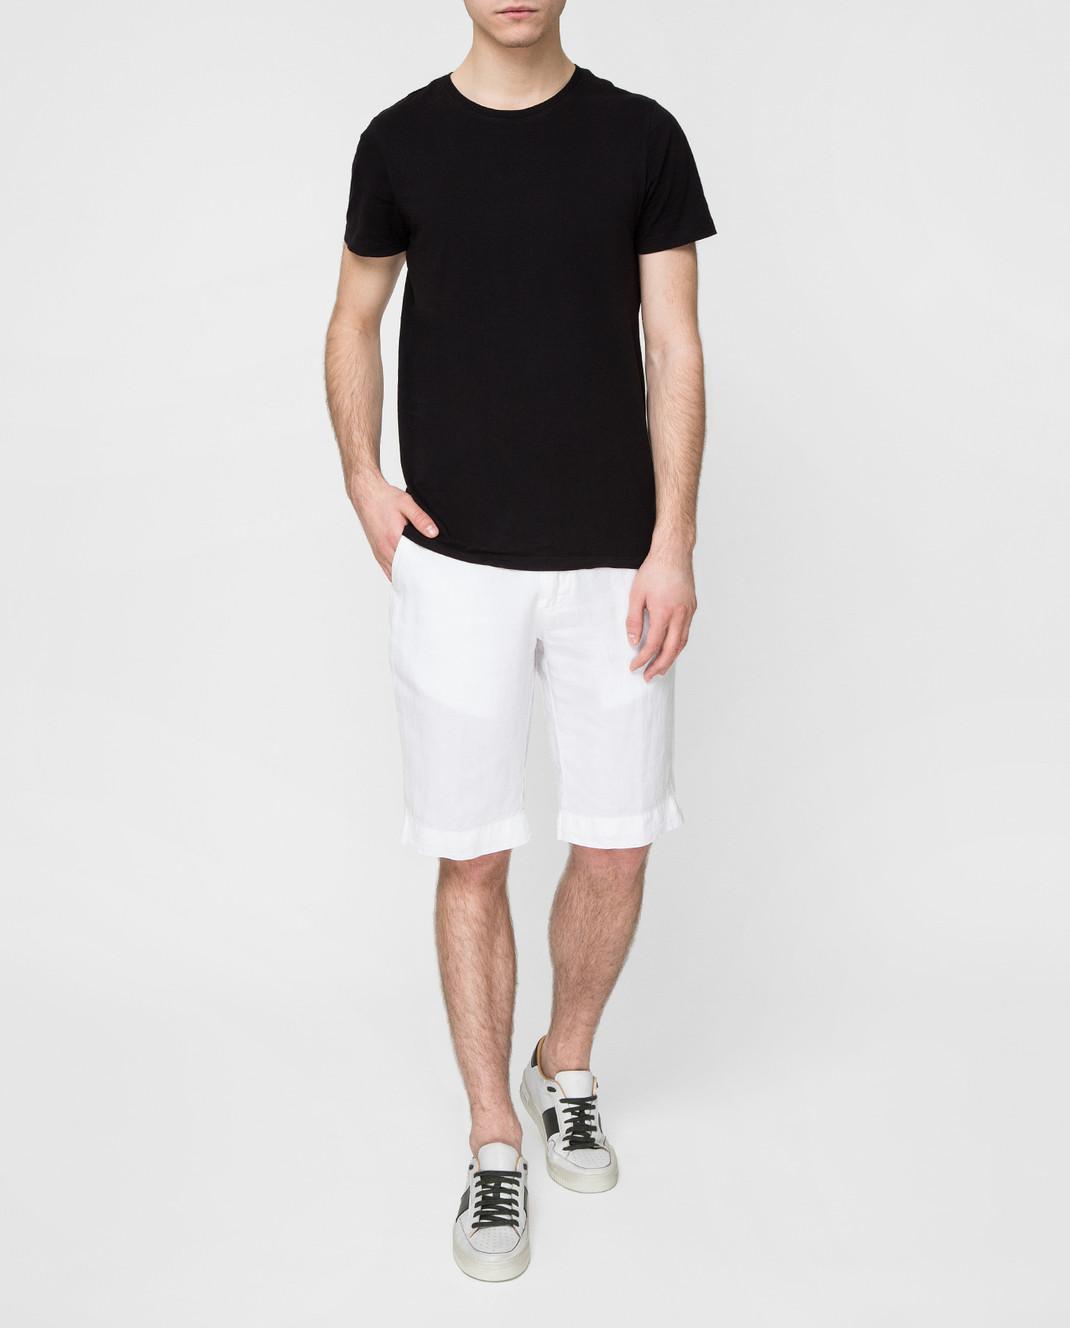 Kiton Белые шорты UPNJSBJ07R66 изображение 2